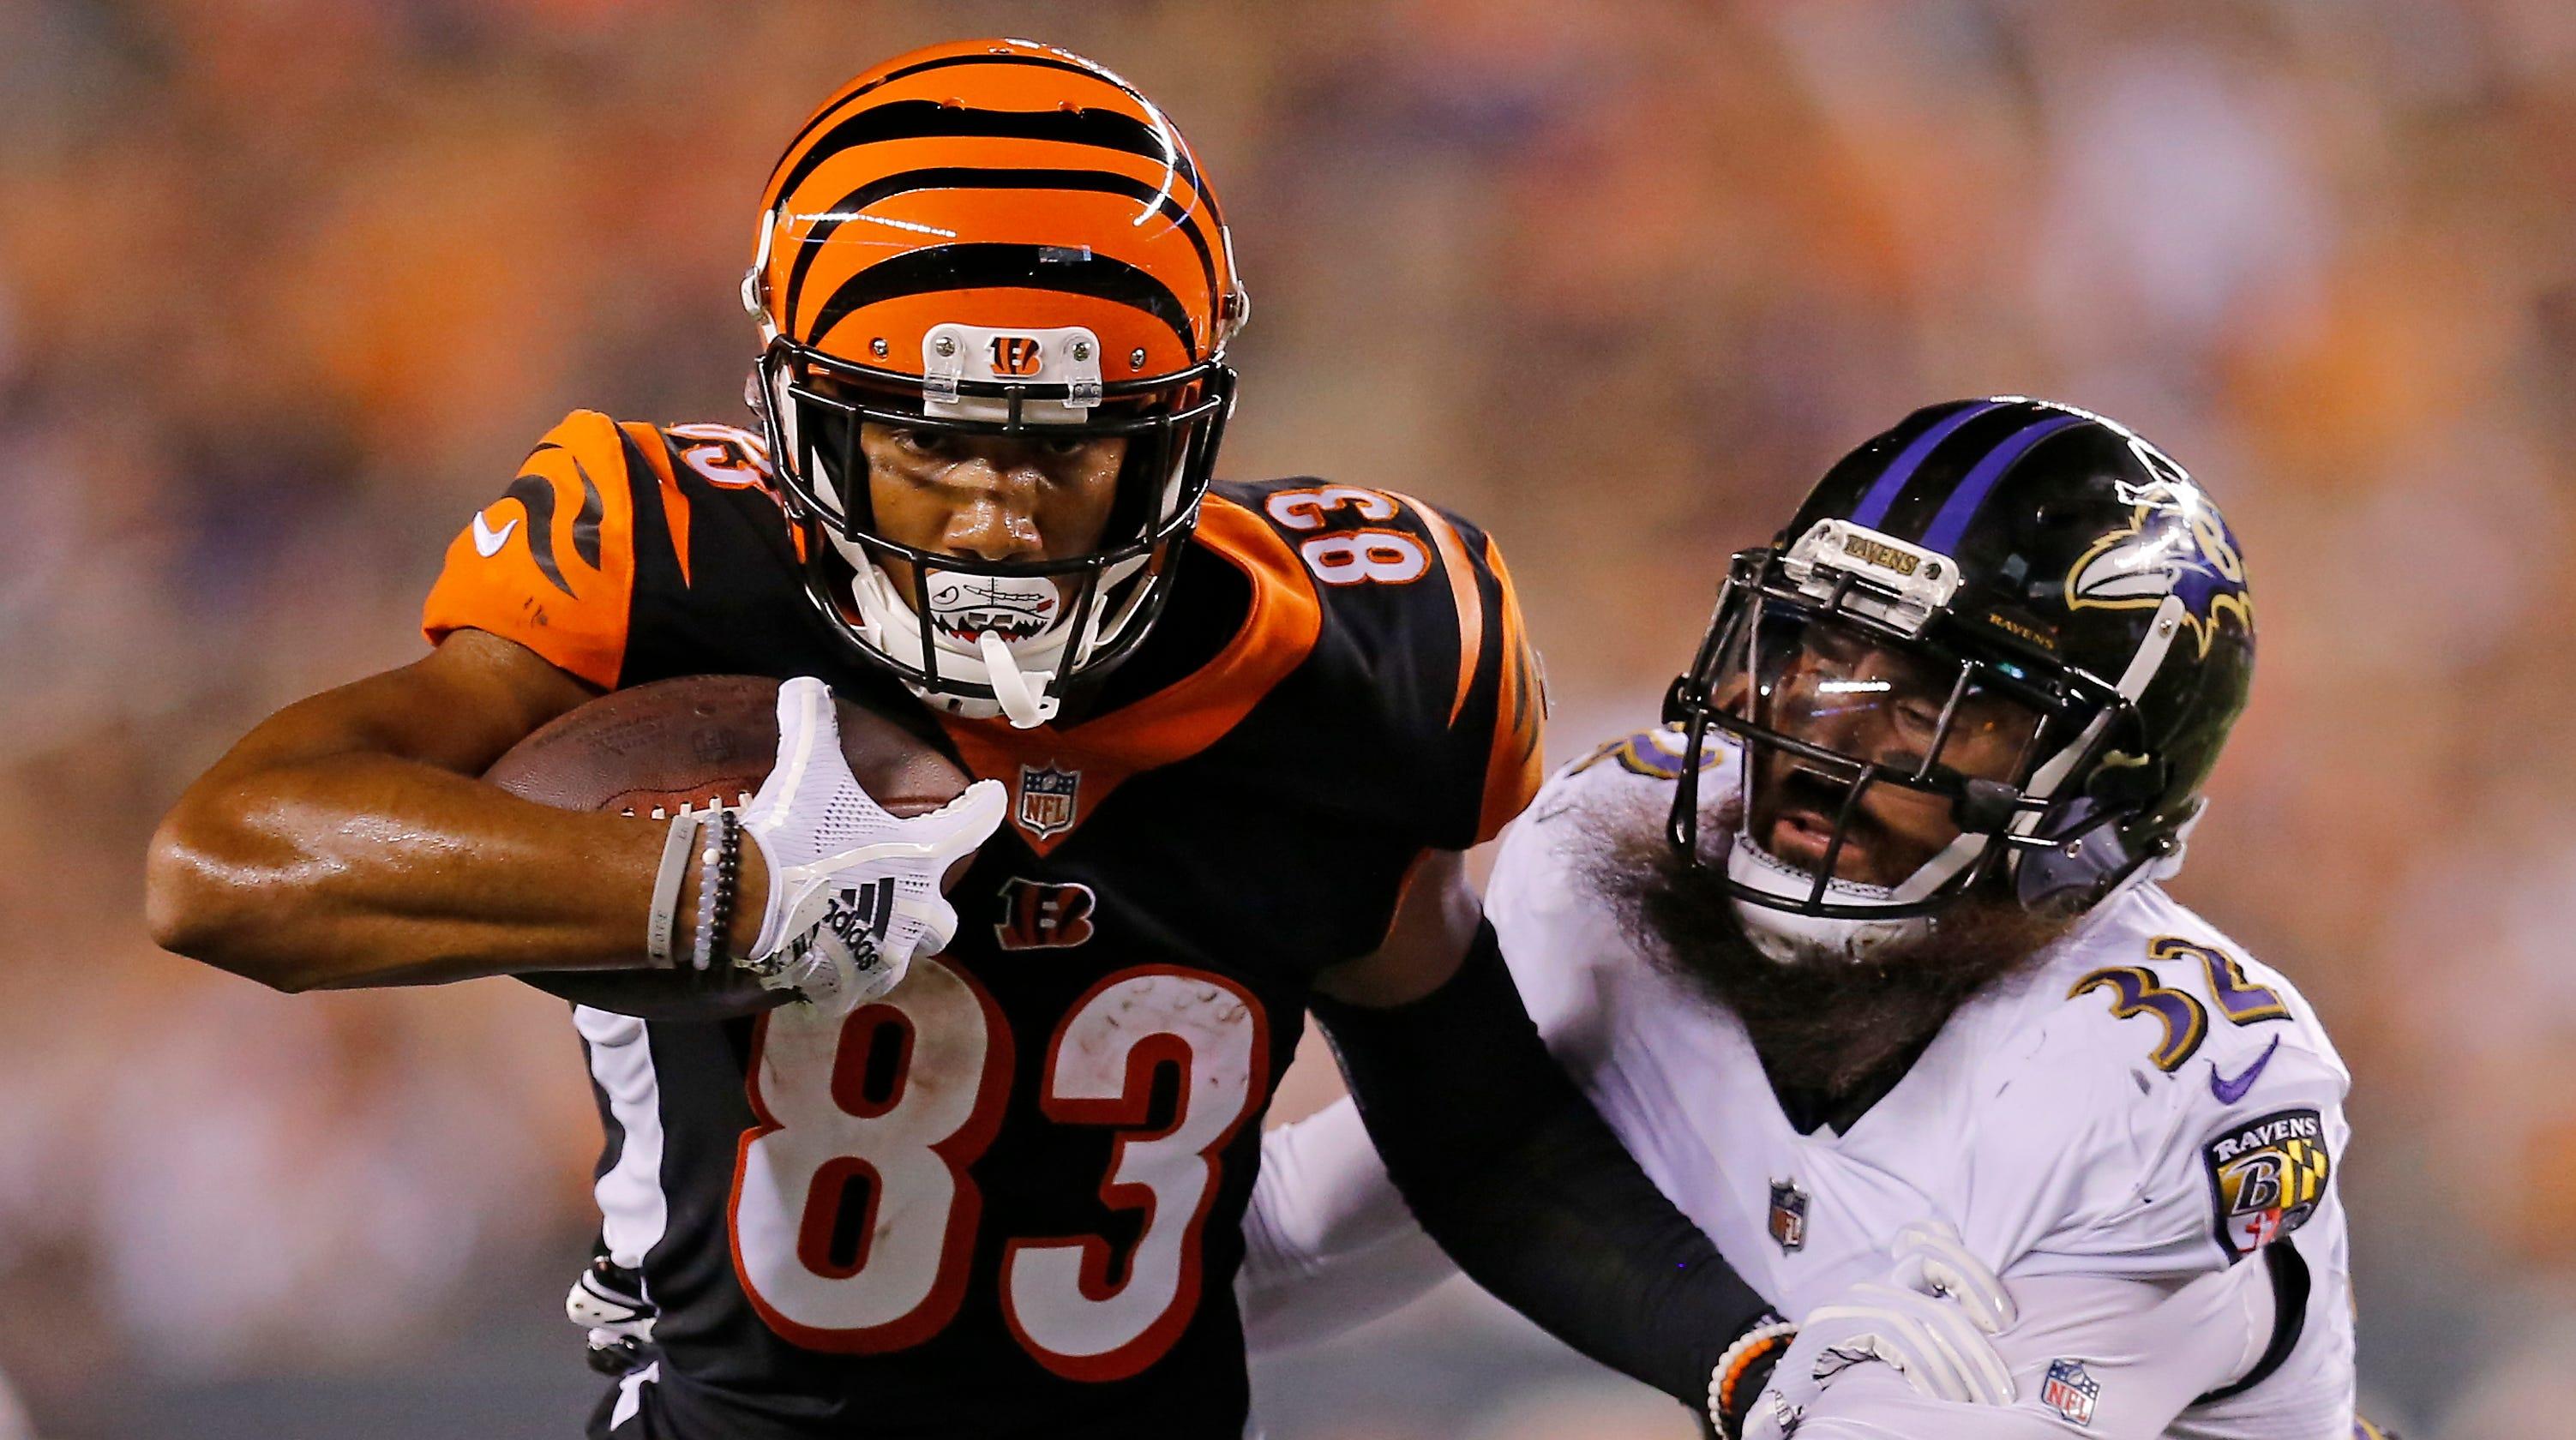 6d928acedb9 Cincinnati Bengals at Baltimore Ravens: TV, odds, history, uniforms and more